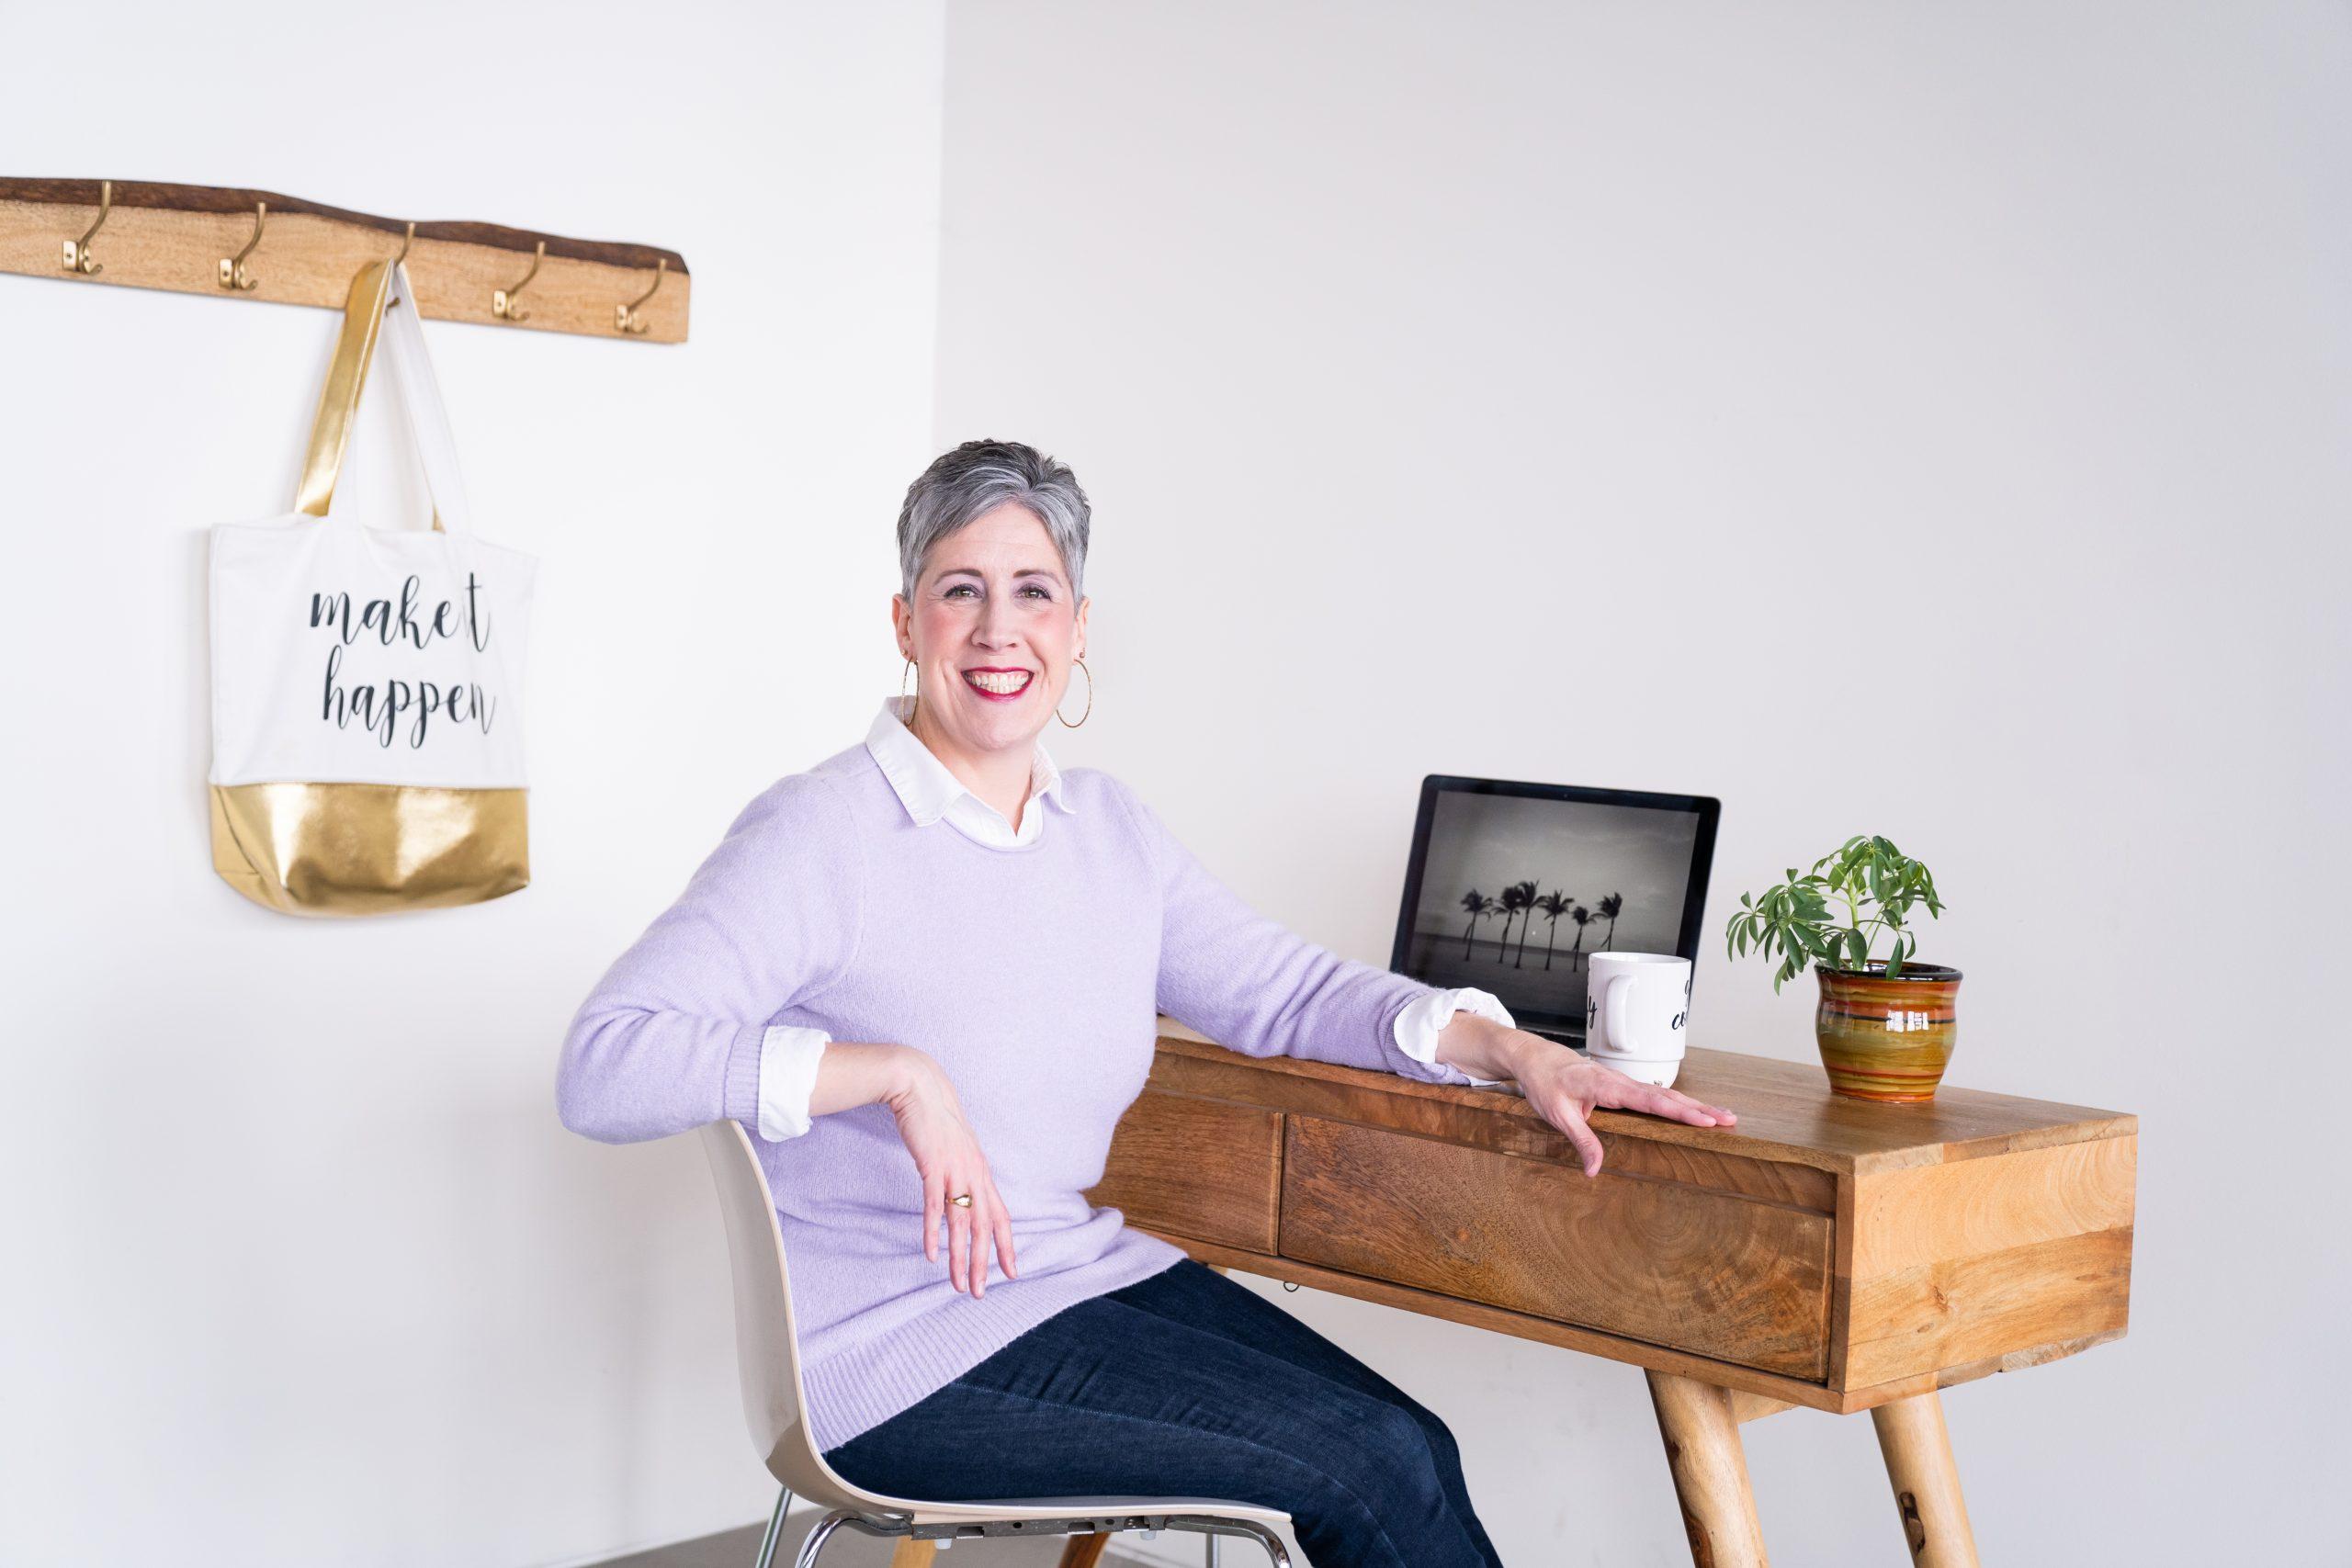 Woman in purple sweater sitting at work desk